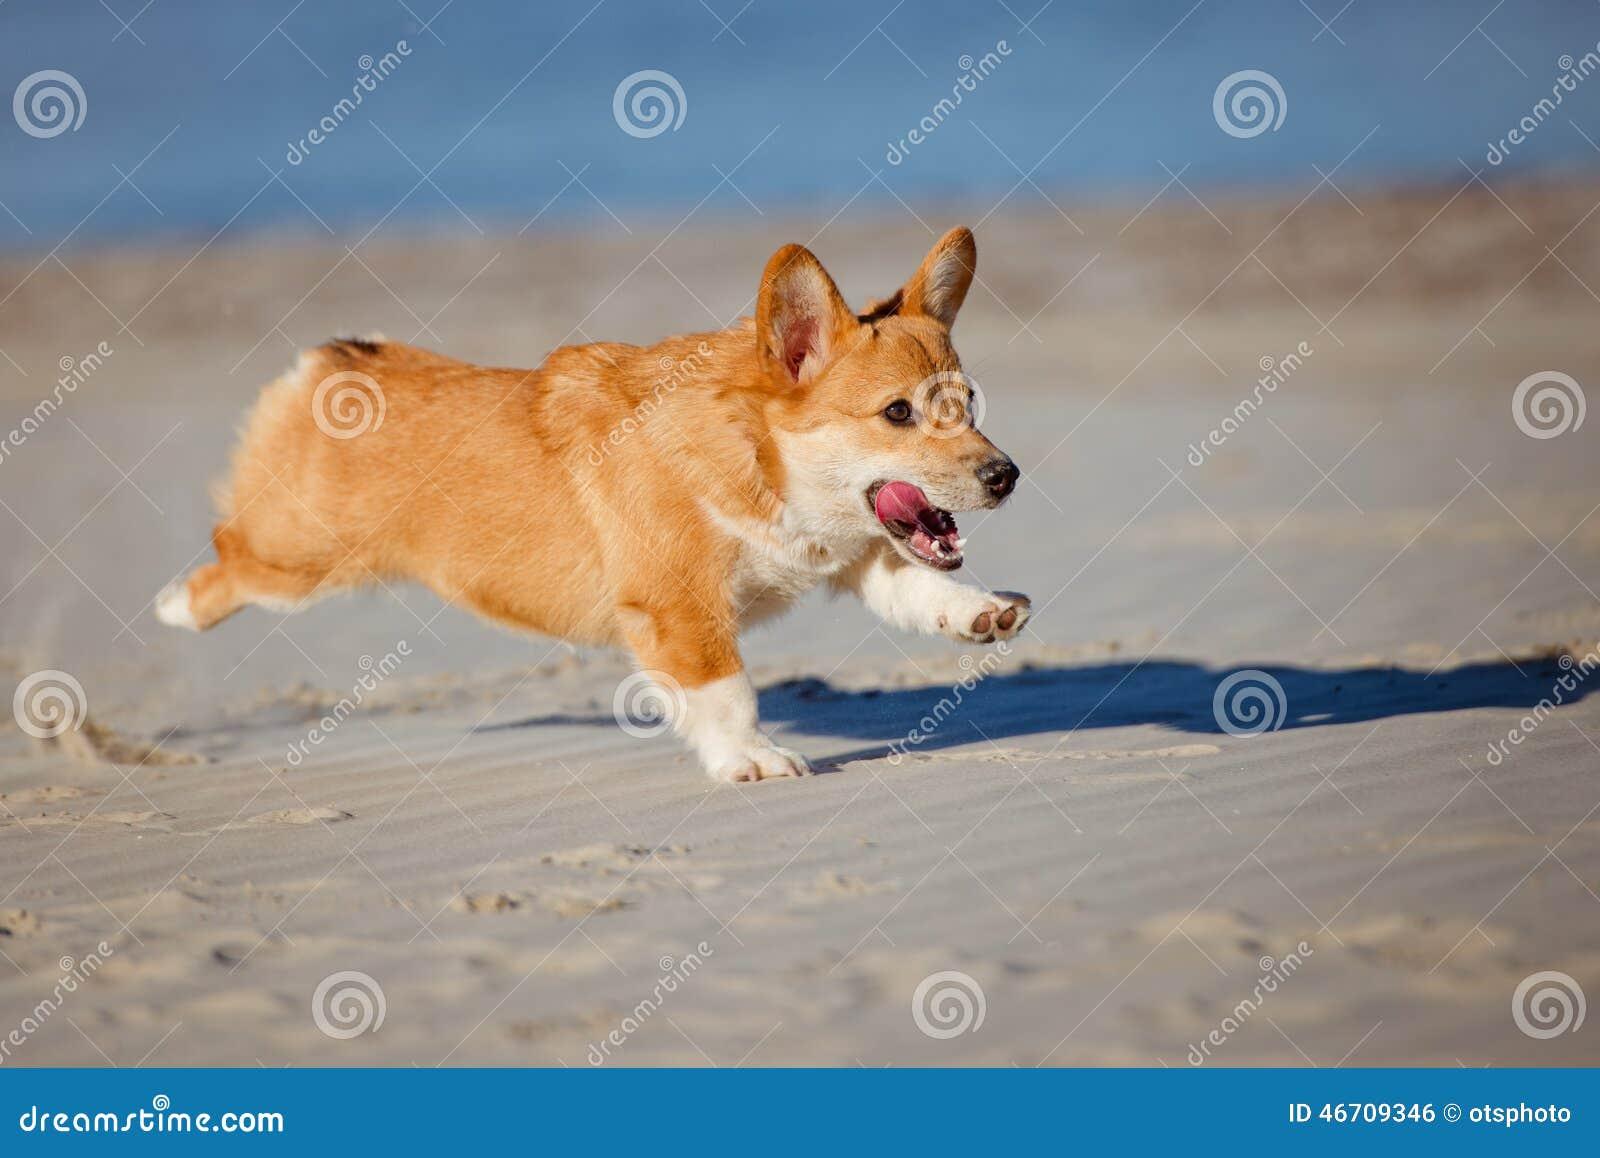 Welsh Corgi Pembroke Dog Running On A ...